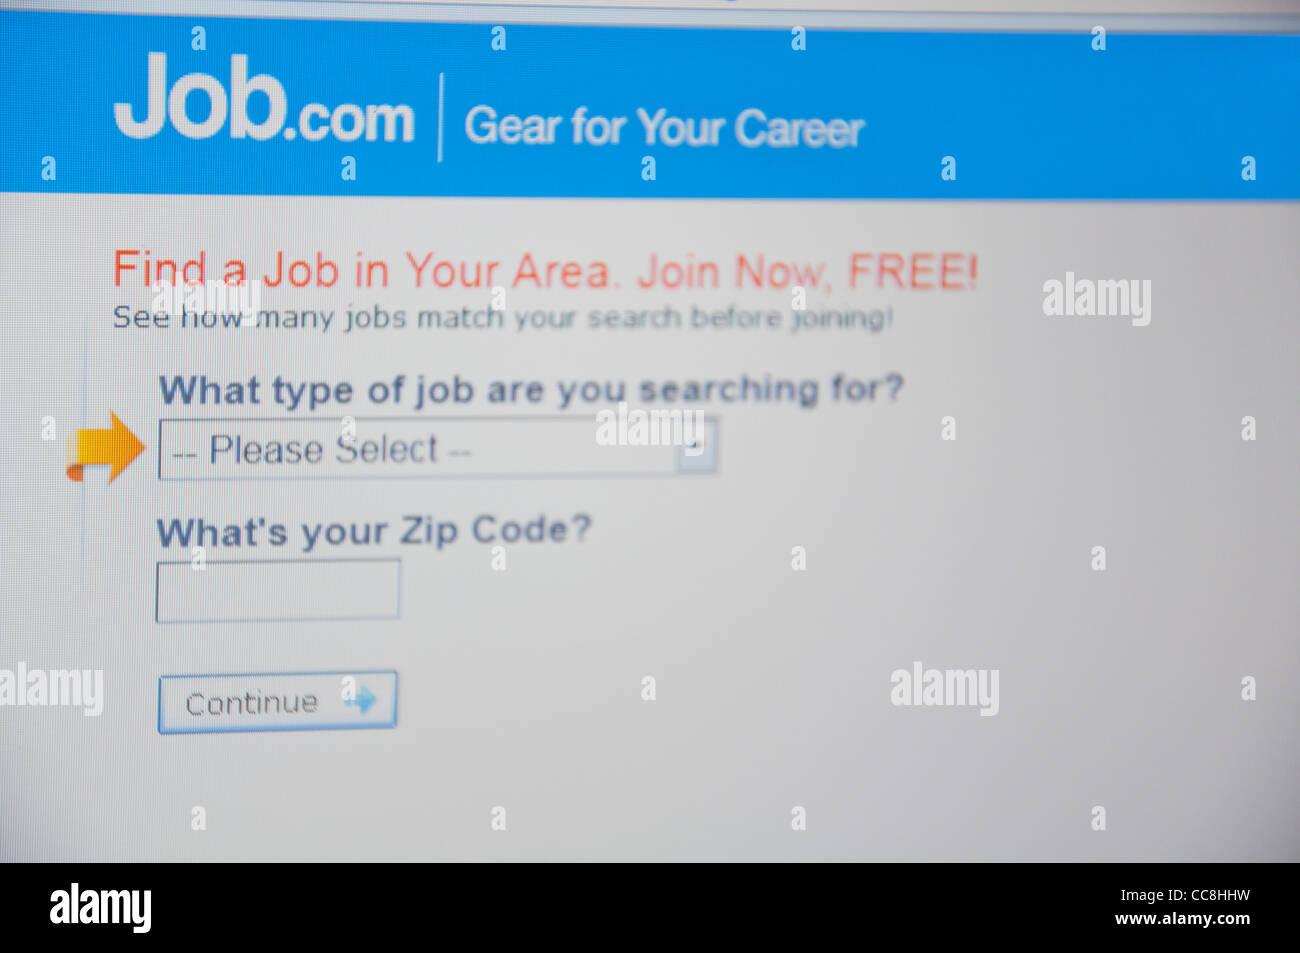 Job website online screenshot screen shot - Stock Image